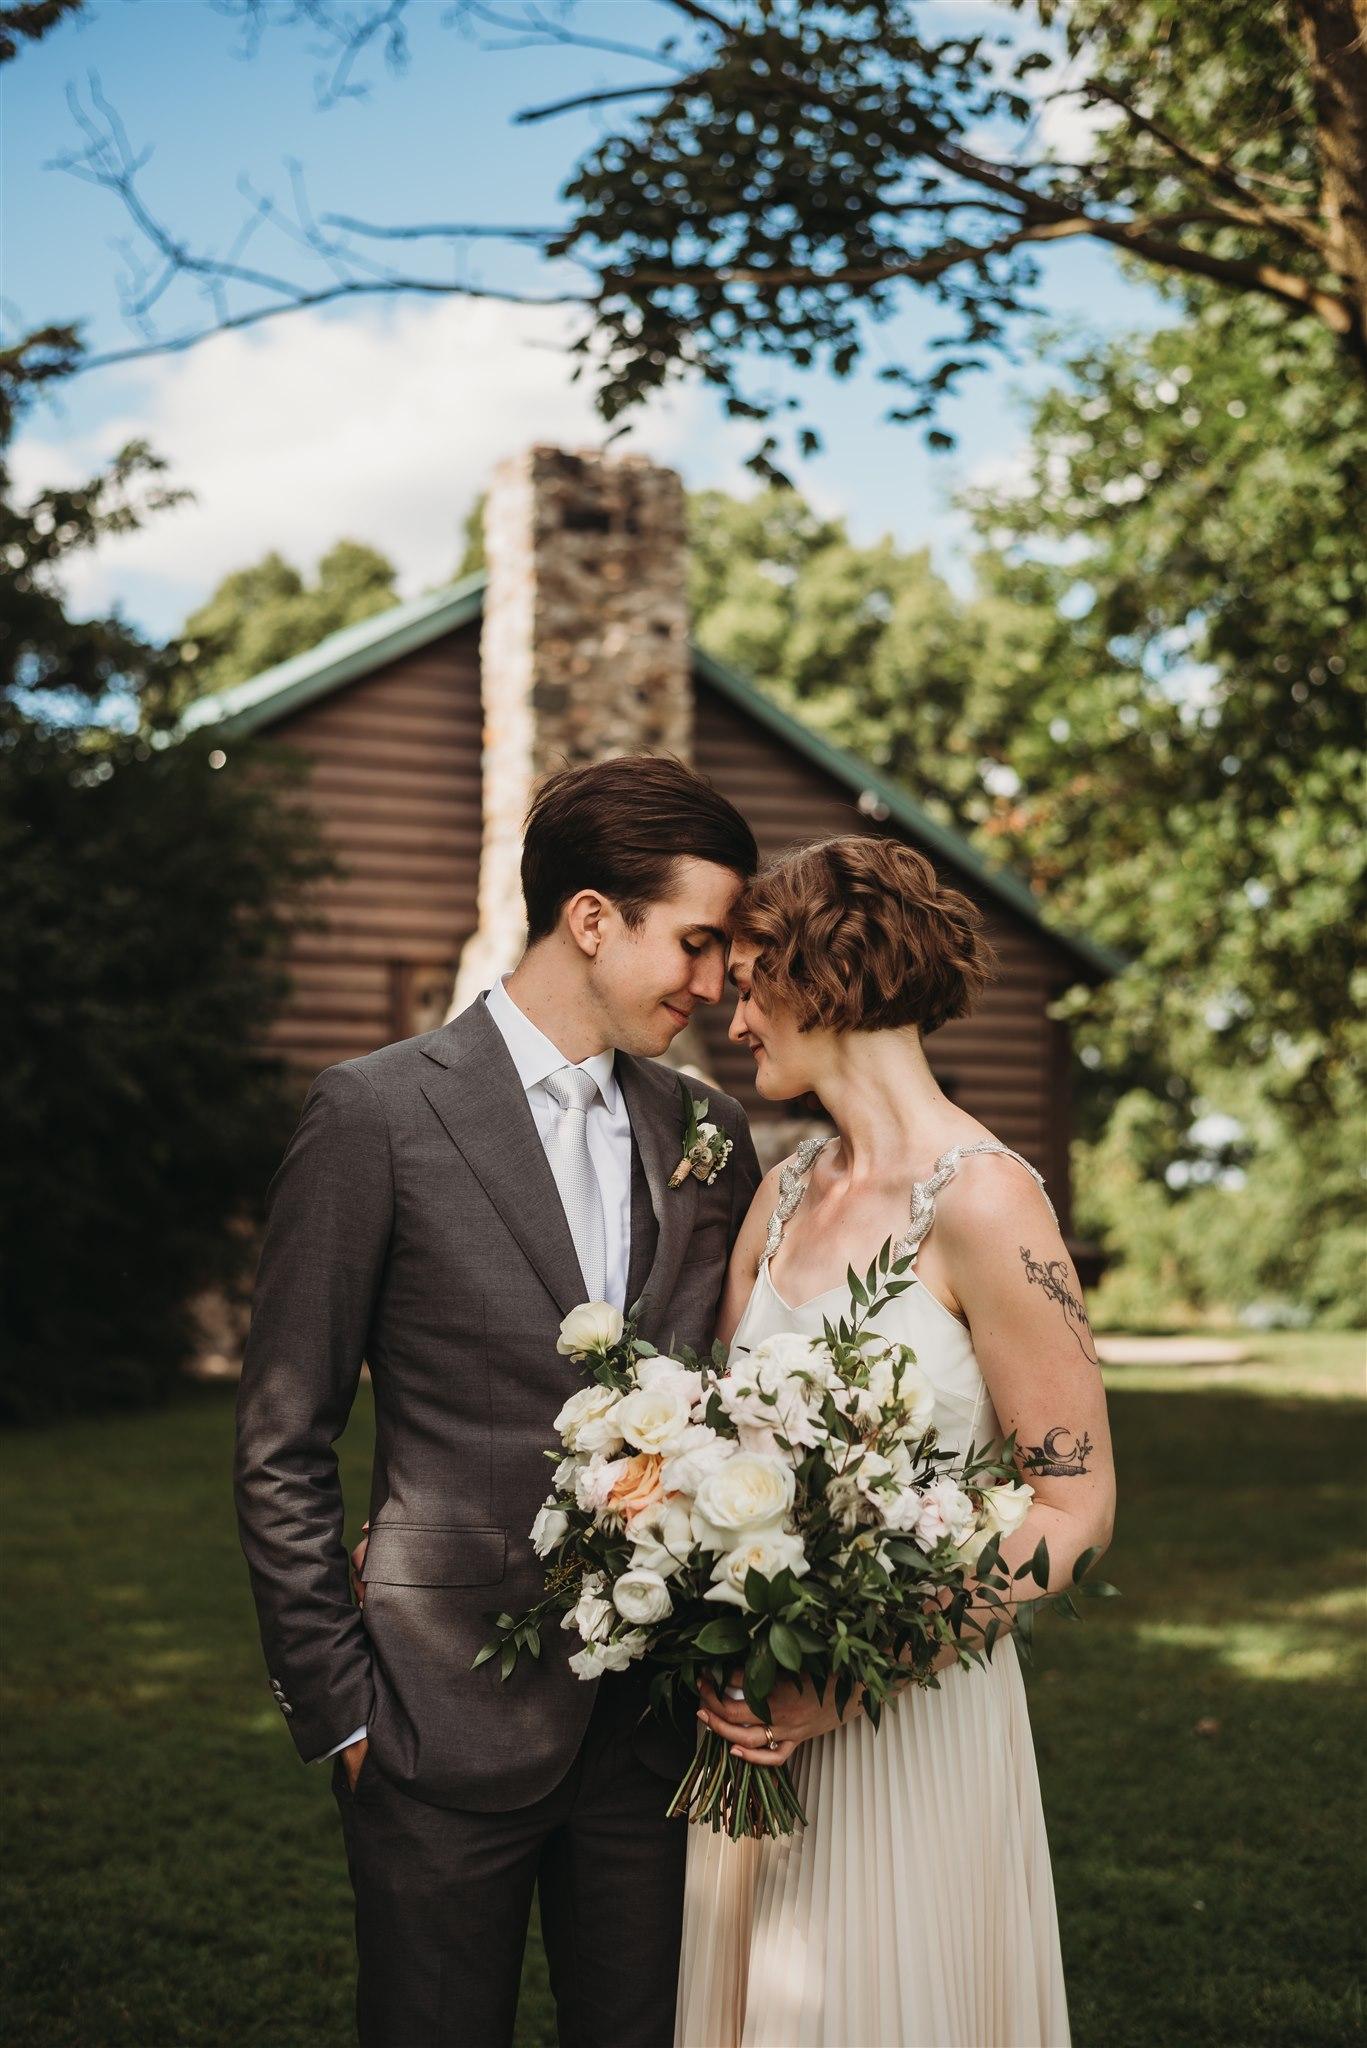 fanshawe conservation area wedding photos 315 1 - Watson Porter Pavillion Wedding